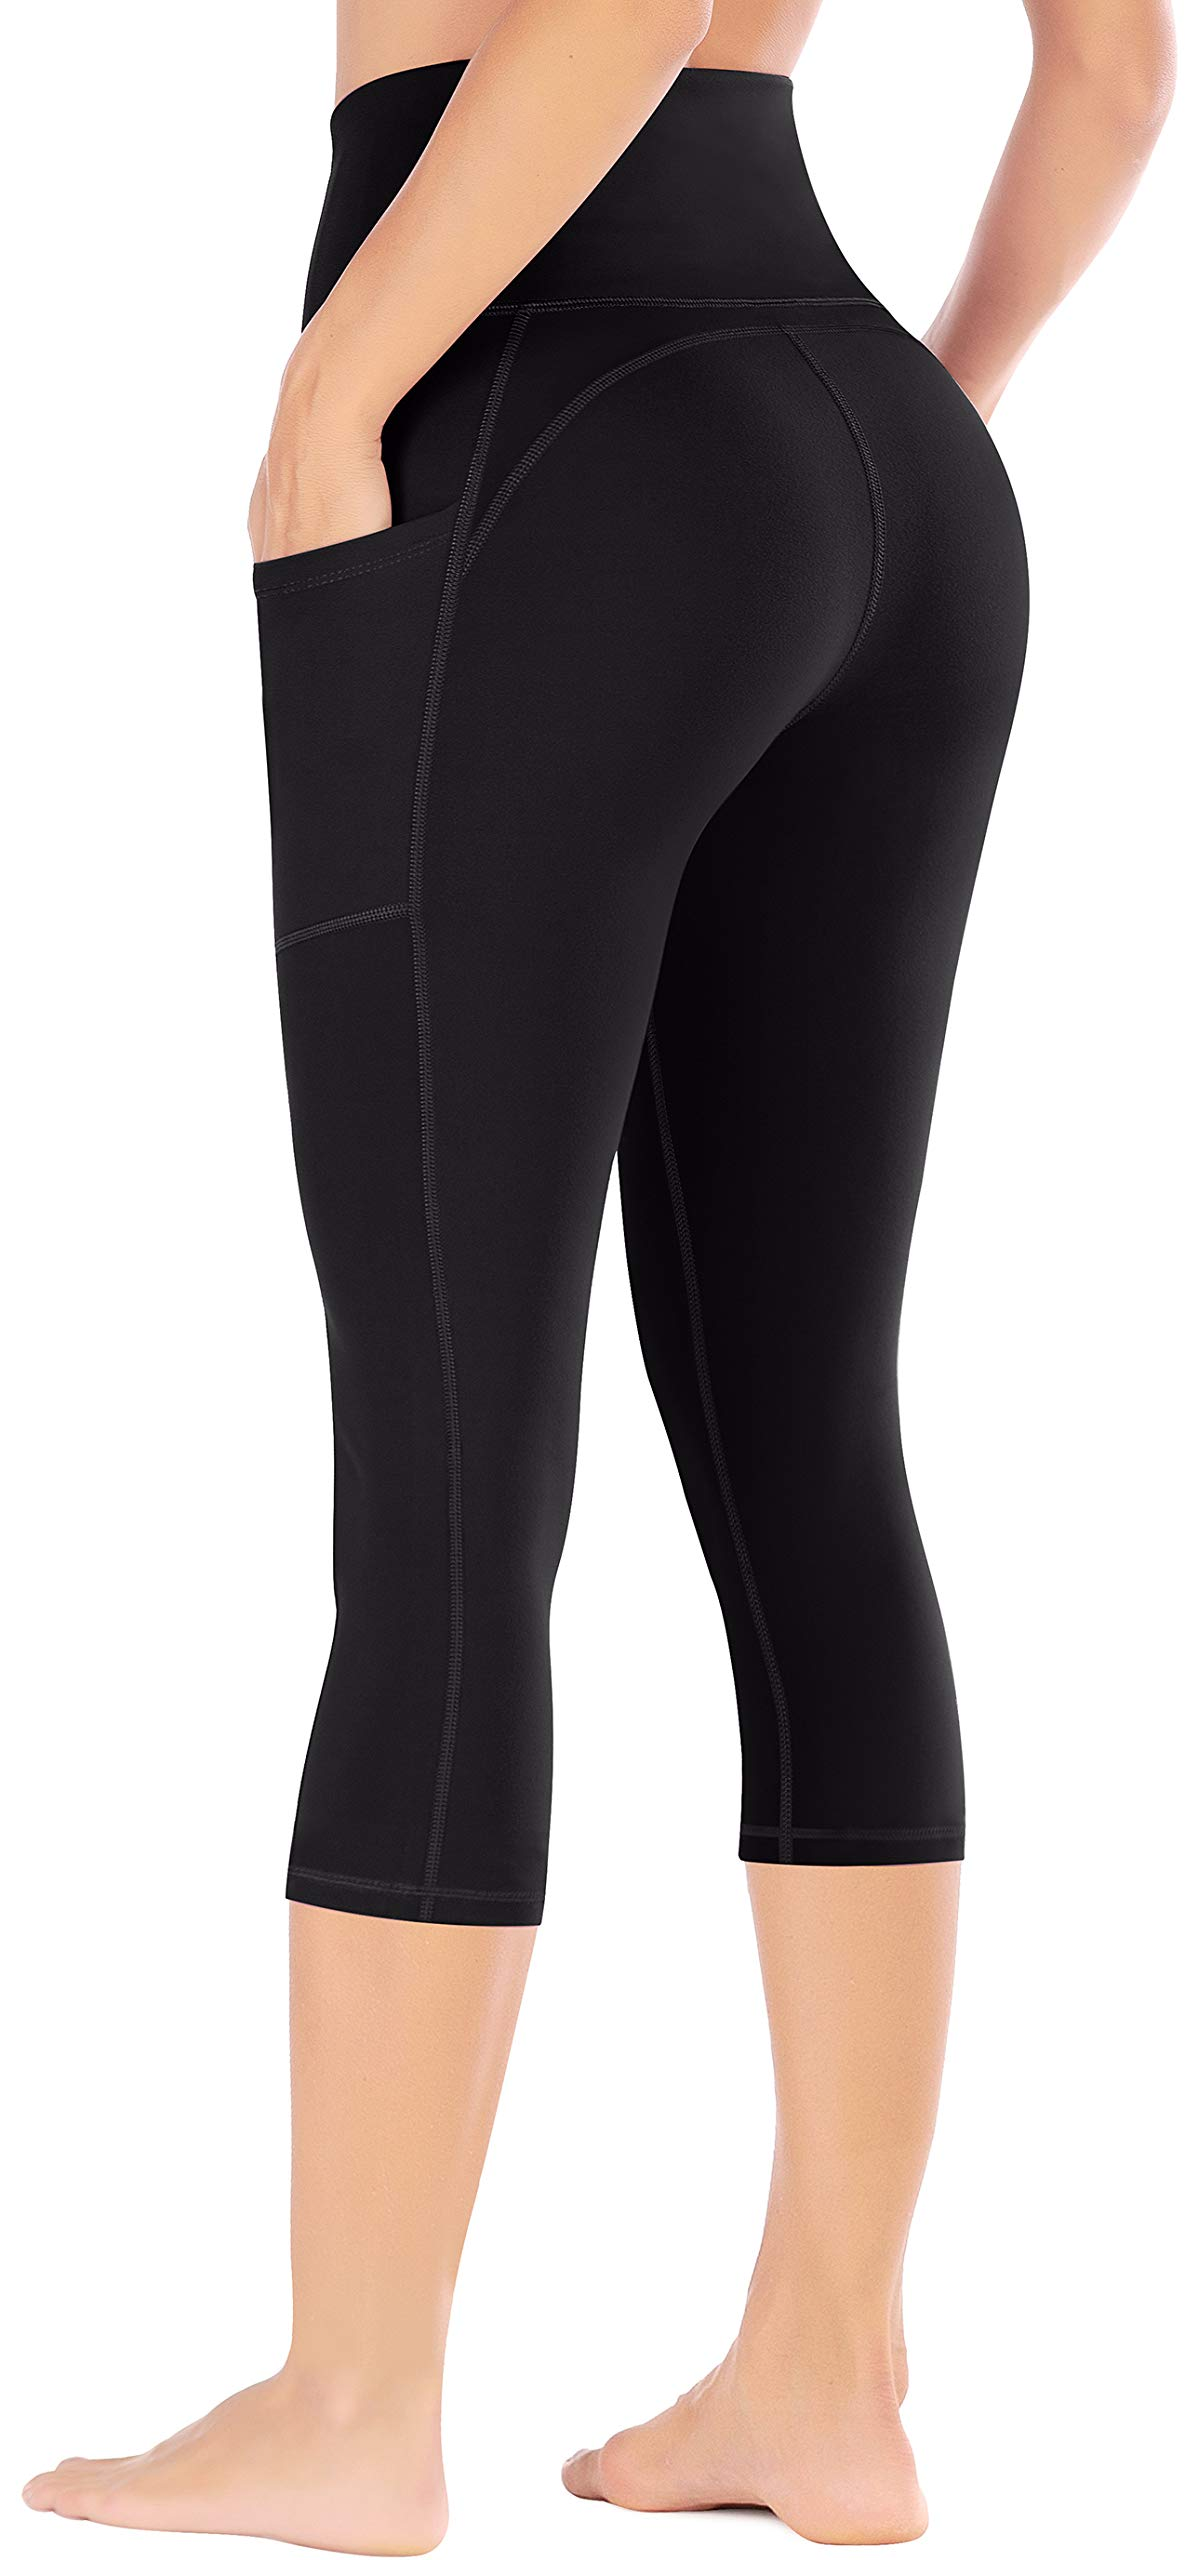 Ewedoos Yoga Pants with Pockets for Women Ultra Soft Leggings with Pockets High Waist Workout Pants (Ew327 Black, XX-Large) by Ewedoos